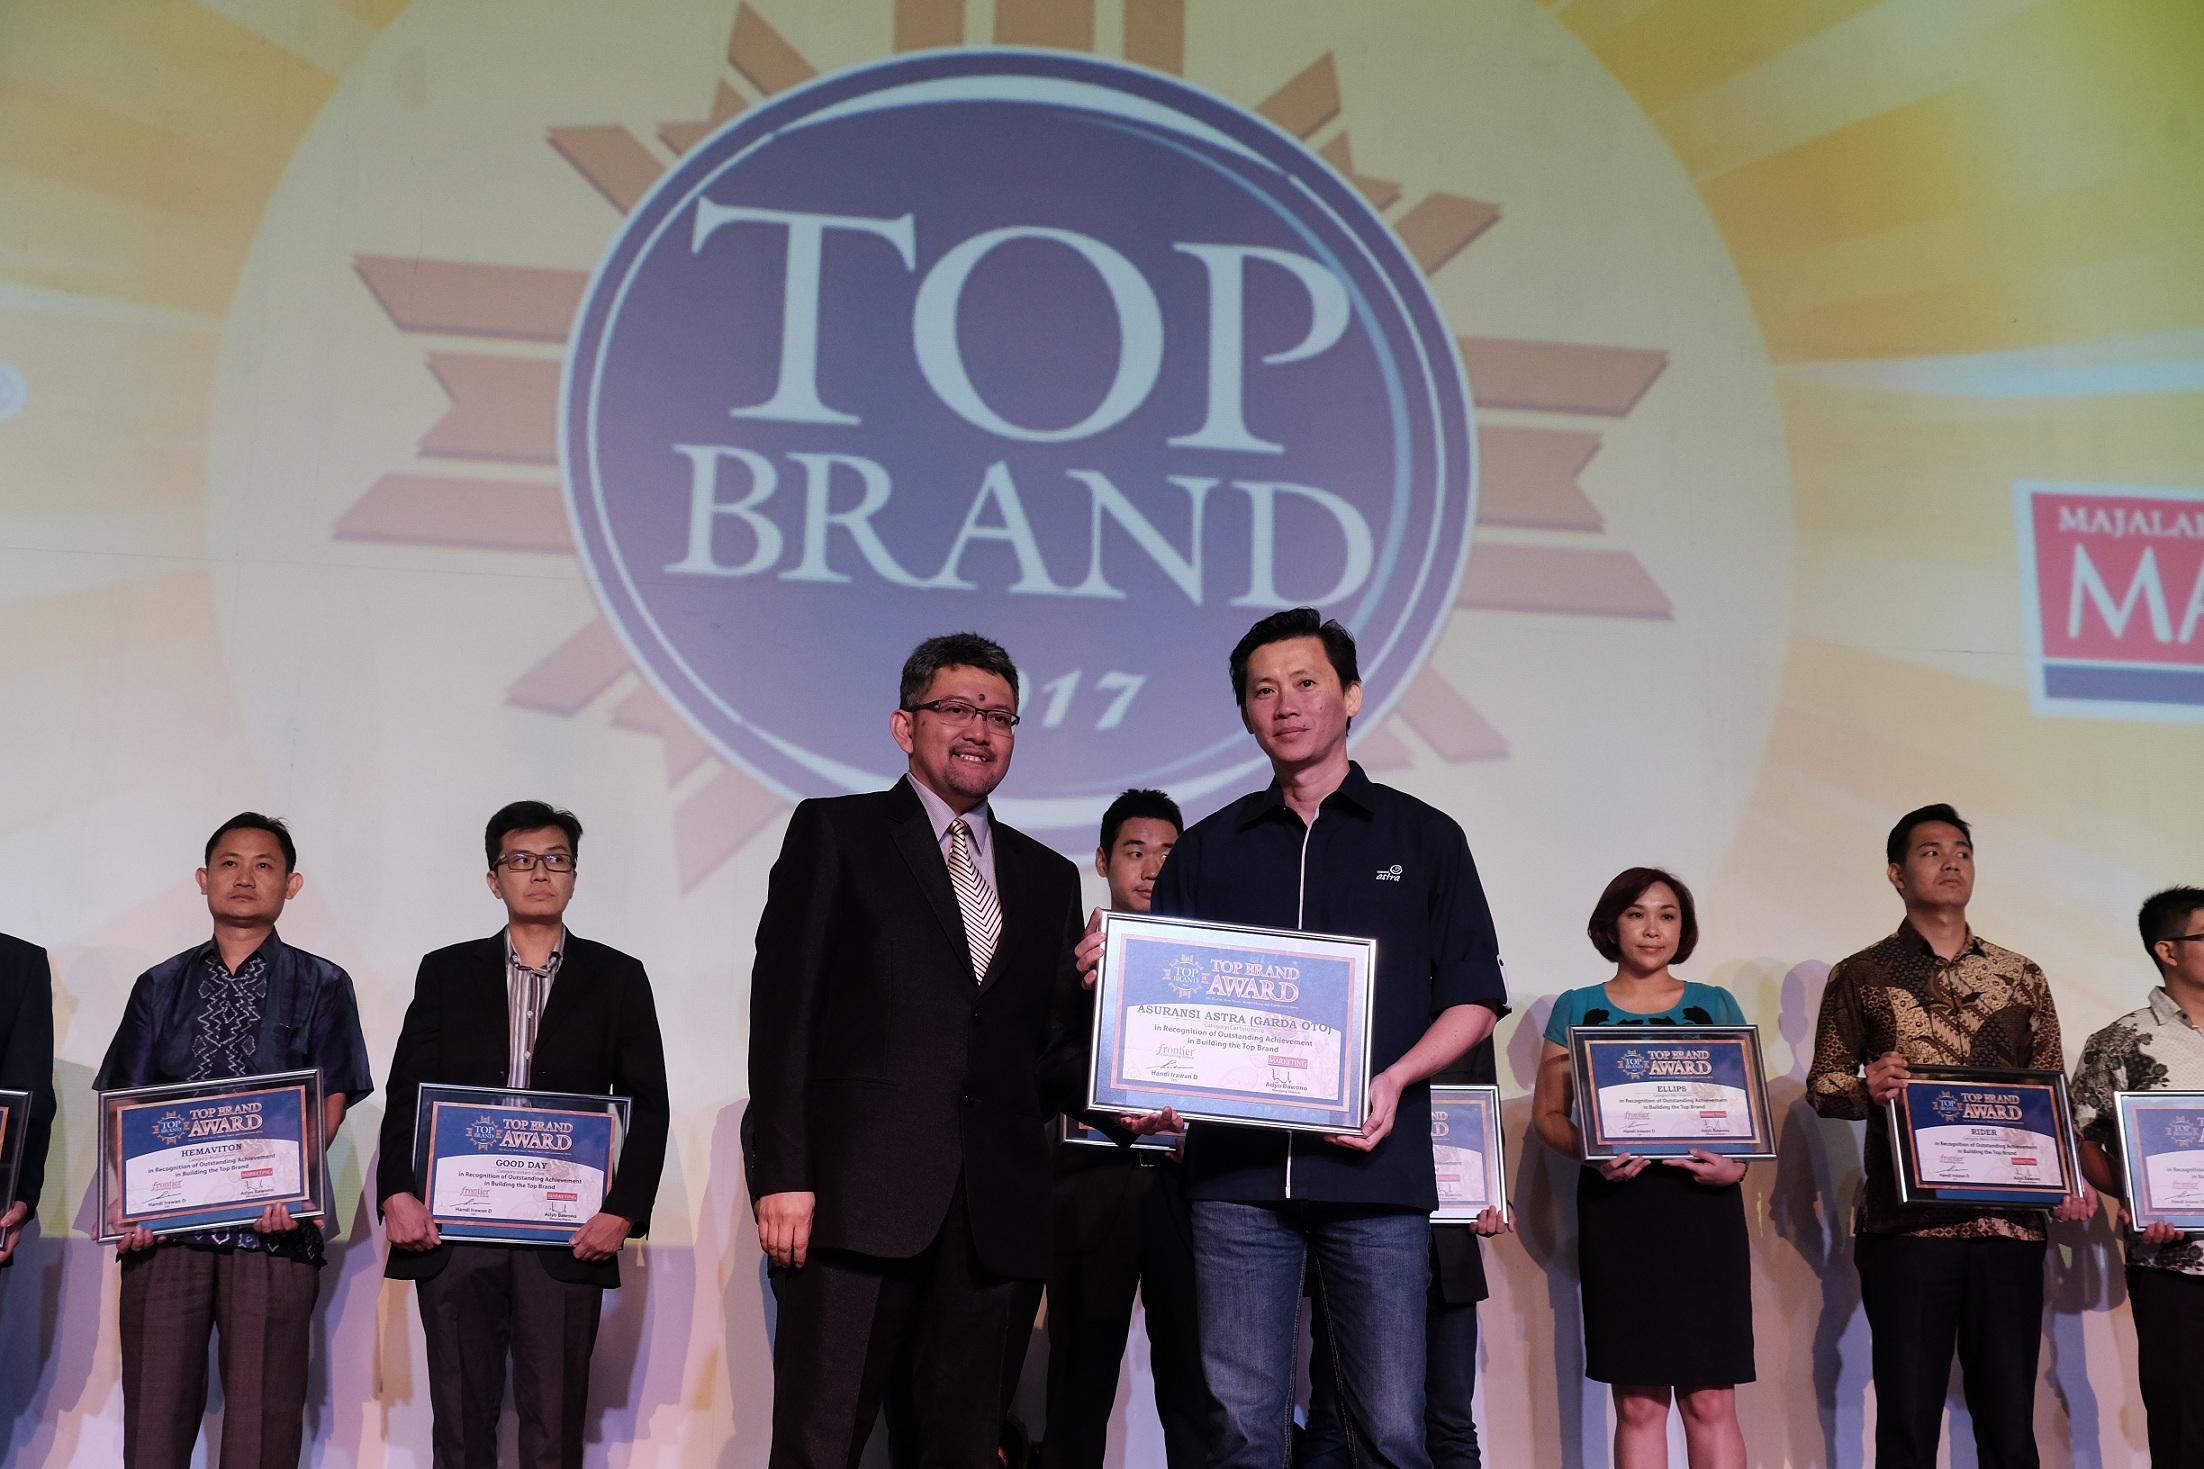 Adrianto, SVP Business Management Asuransi Astra (kanan) mewakili Asuransi Astra menerima penghargaan Top Brand 2017